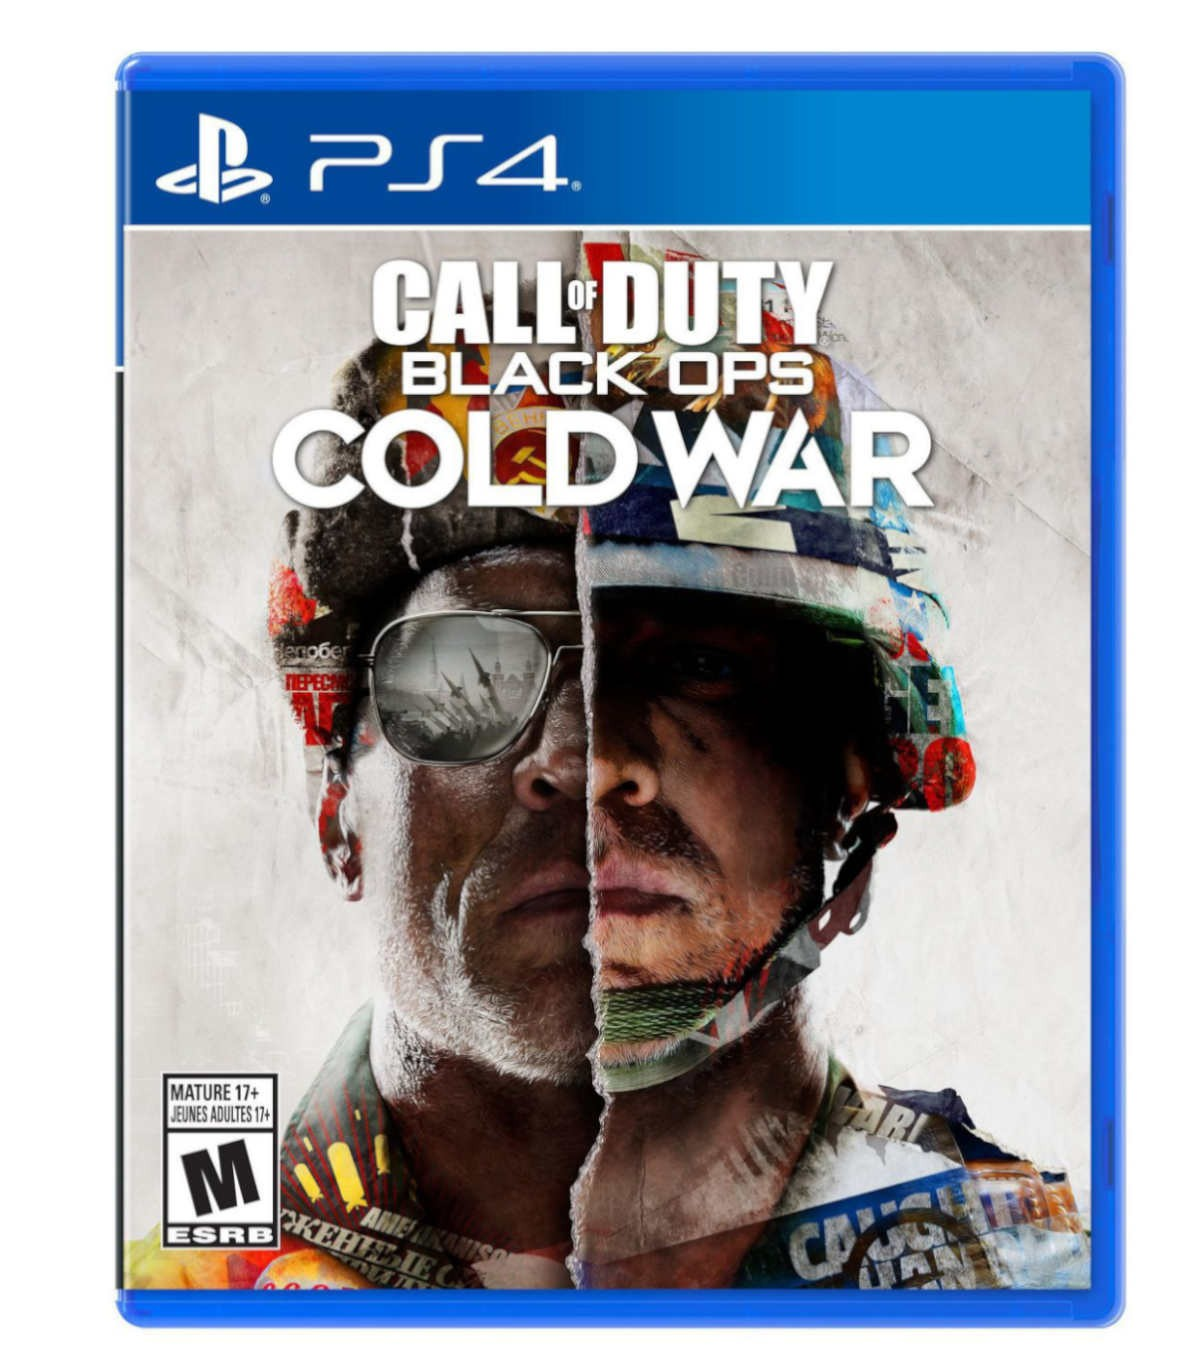 بازی Call of Duty: Black Ops Cold War کارکرده - پلی استیشن 4